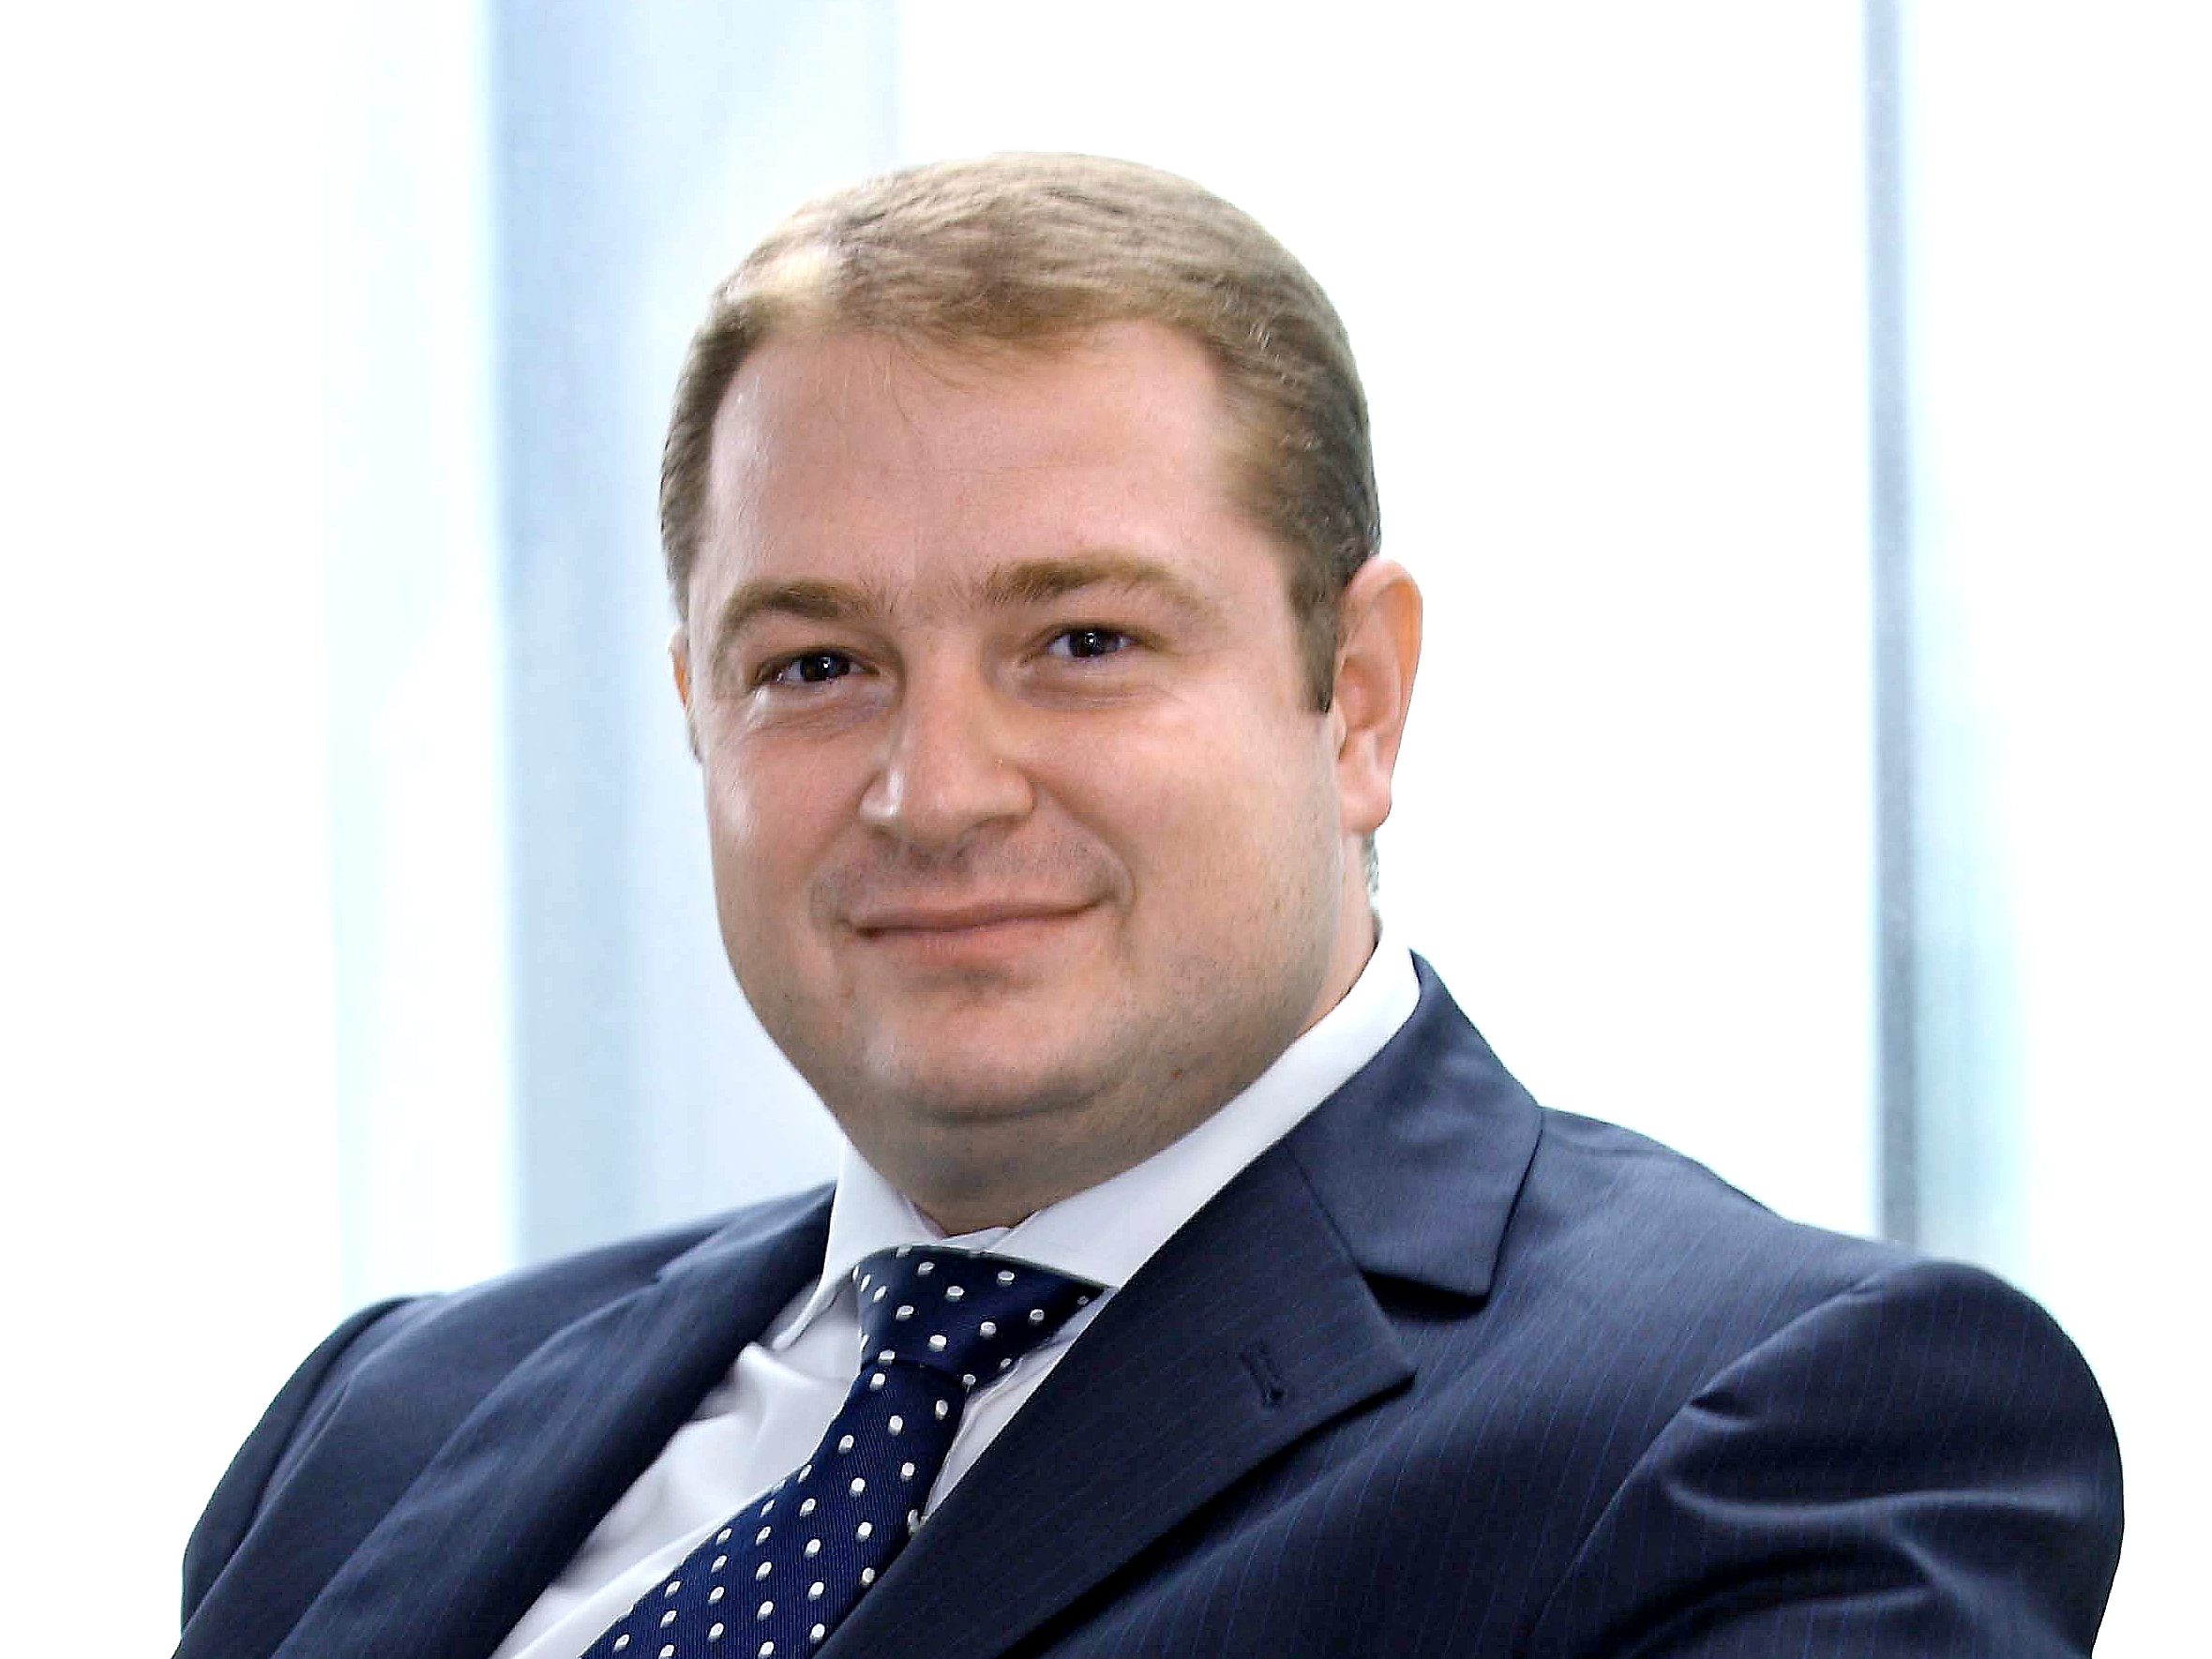 Mediul de business trebuie sa devina locomotiva societatii – Catalin Dima pentru Wall-Street.ro